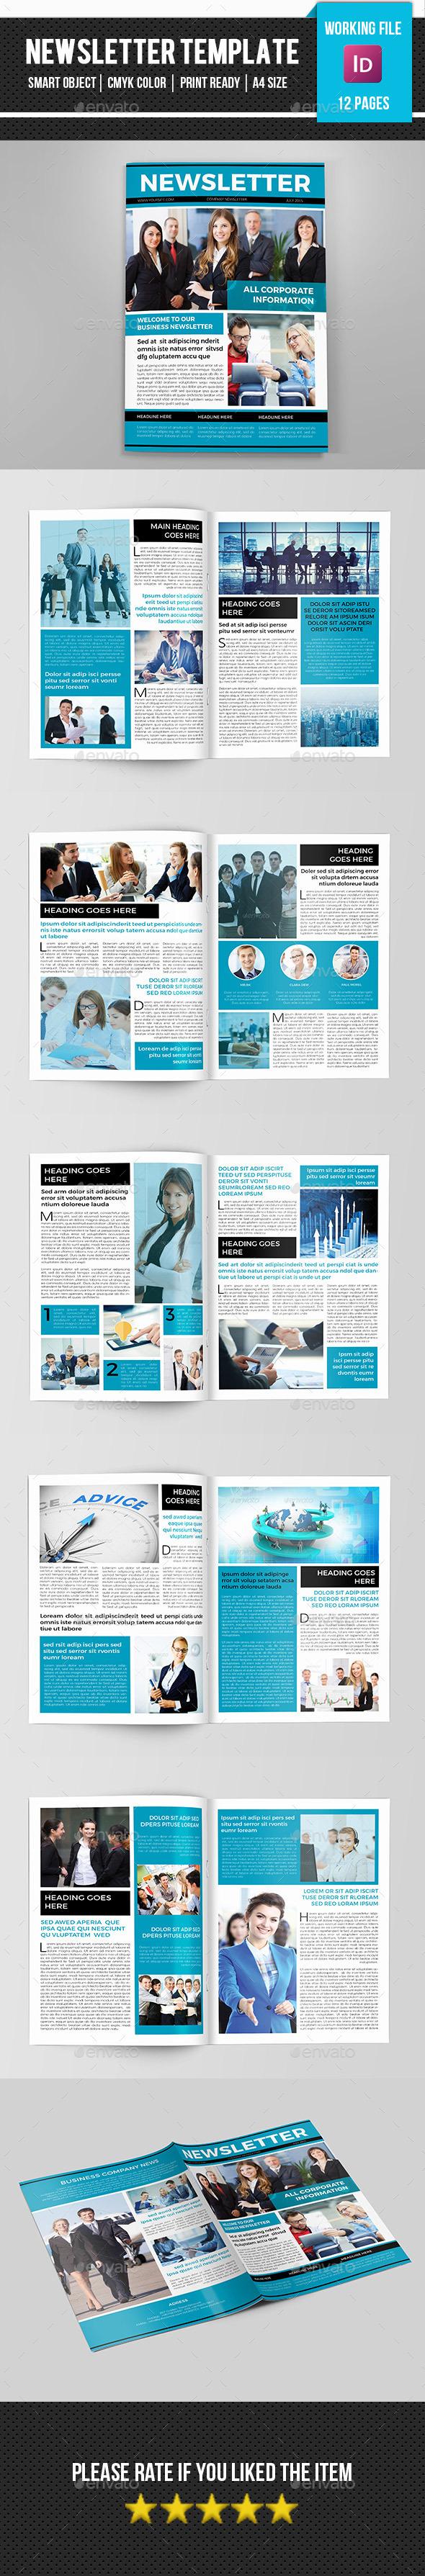 Corporate Newsletter-V08 - Newsletters Print Templates